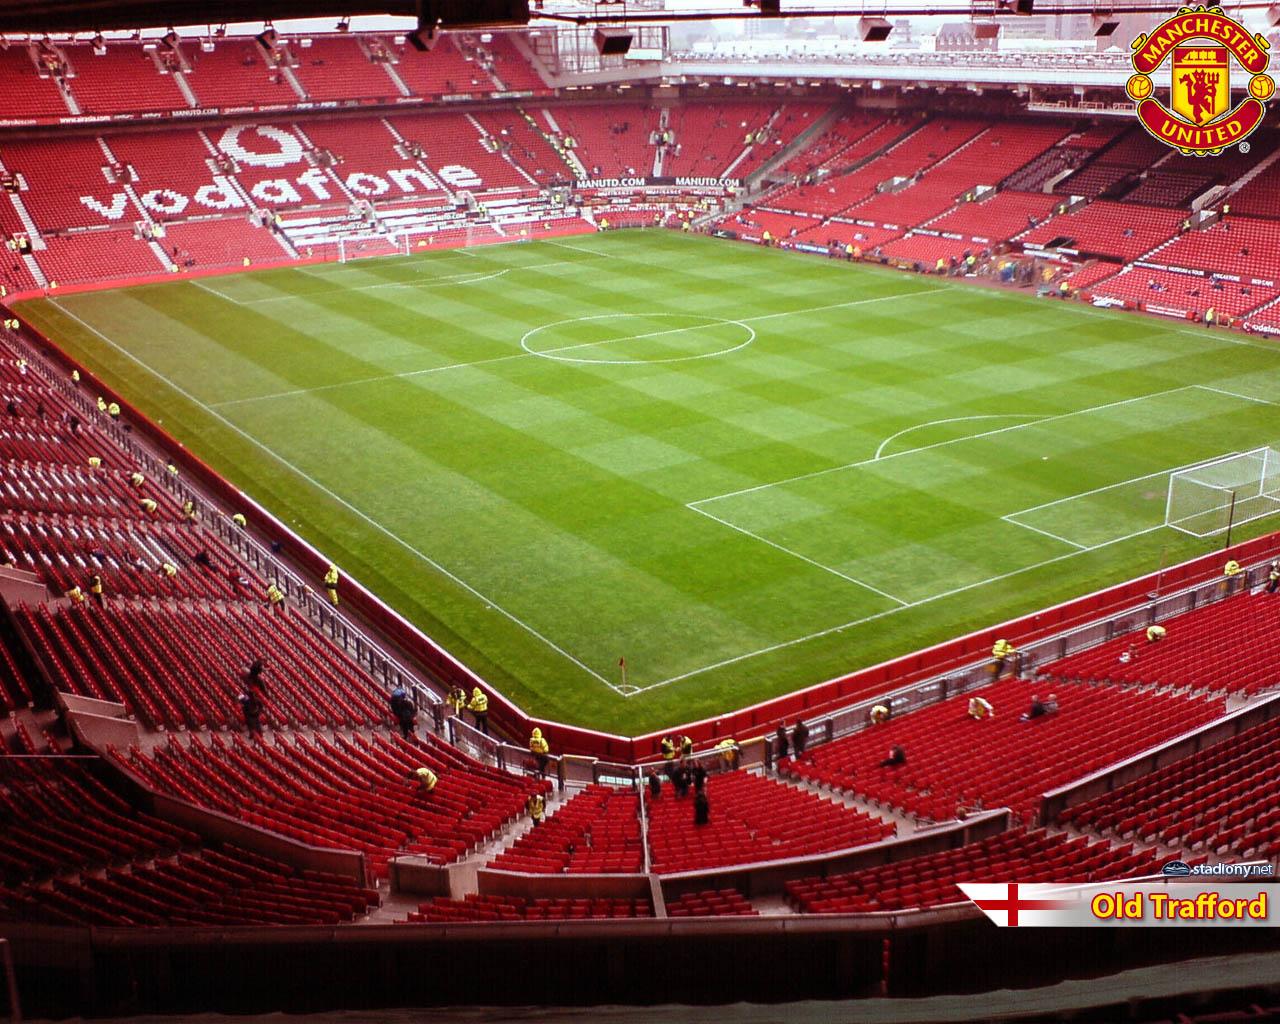 Stadion Manchester United